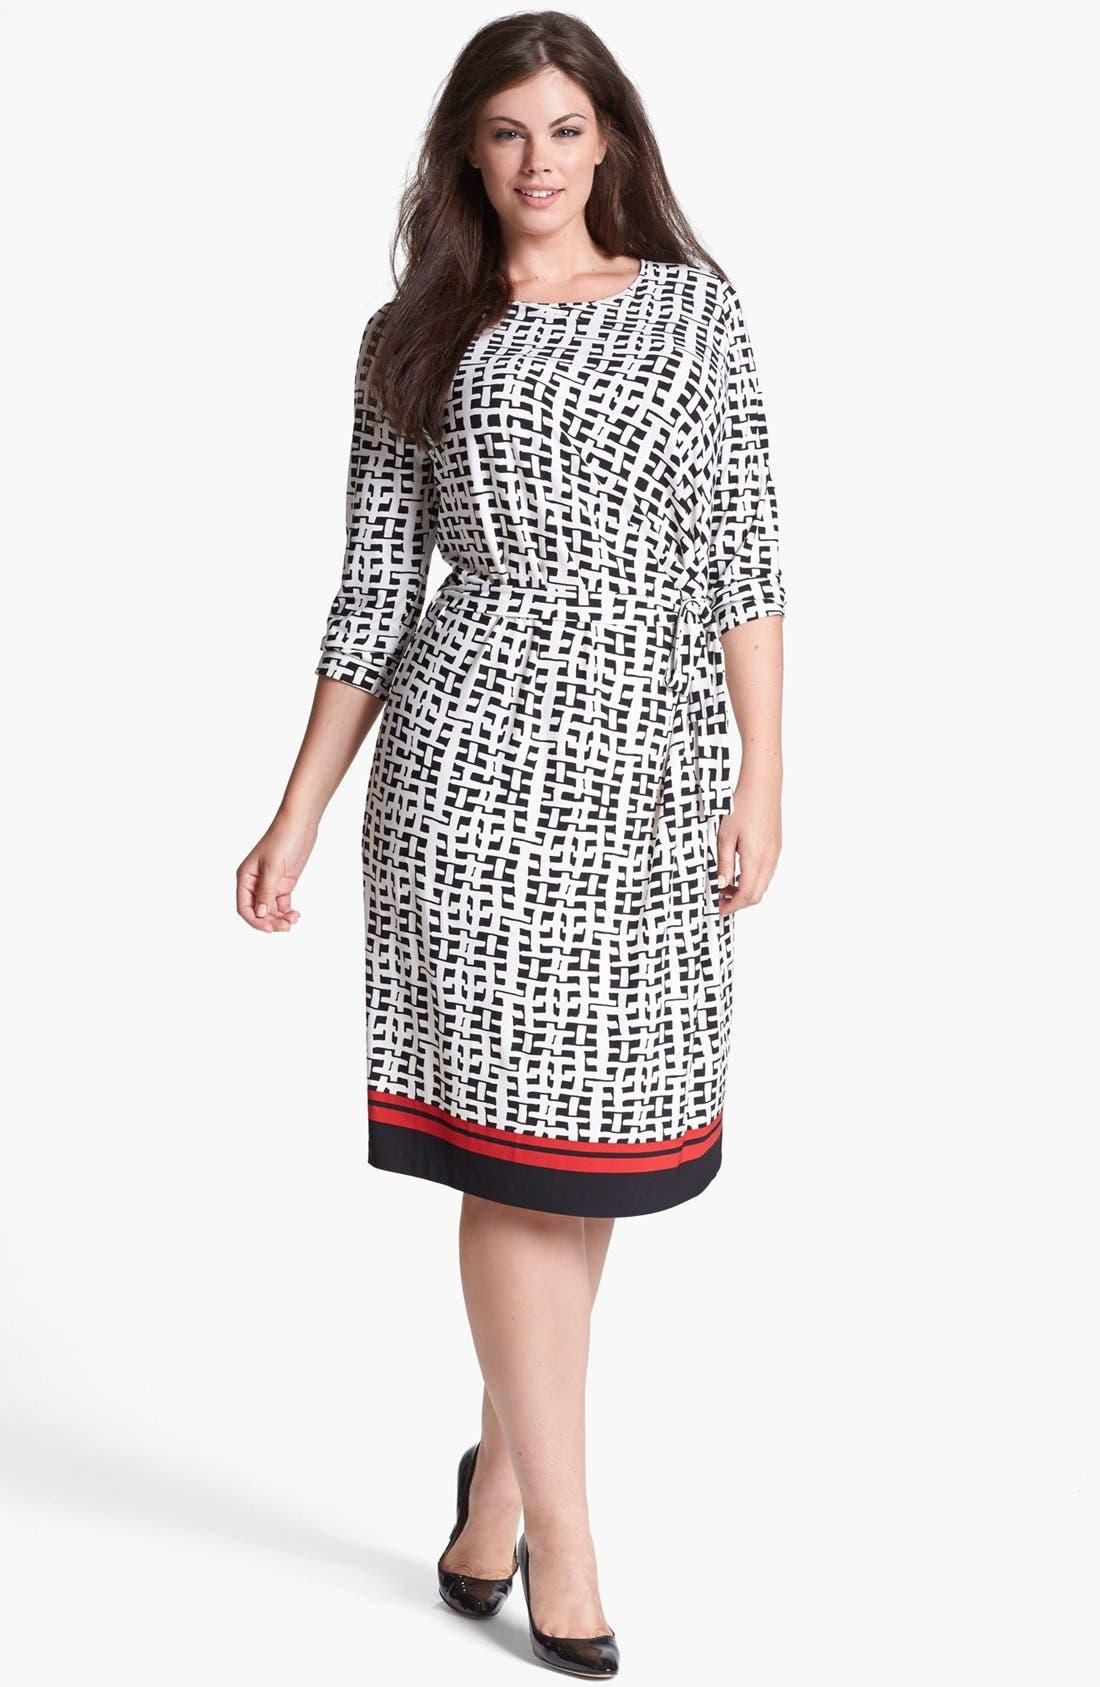 Alternate Image 1 Selected - Anne Klein Print Jersey Faux Wrap Dress (Plus Size)